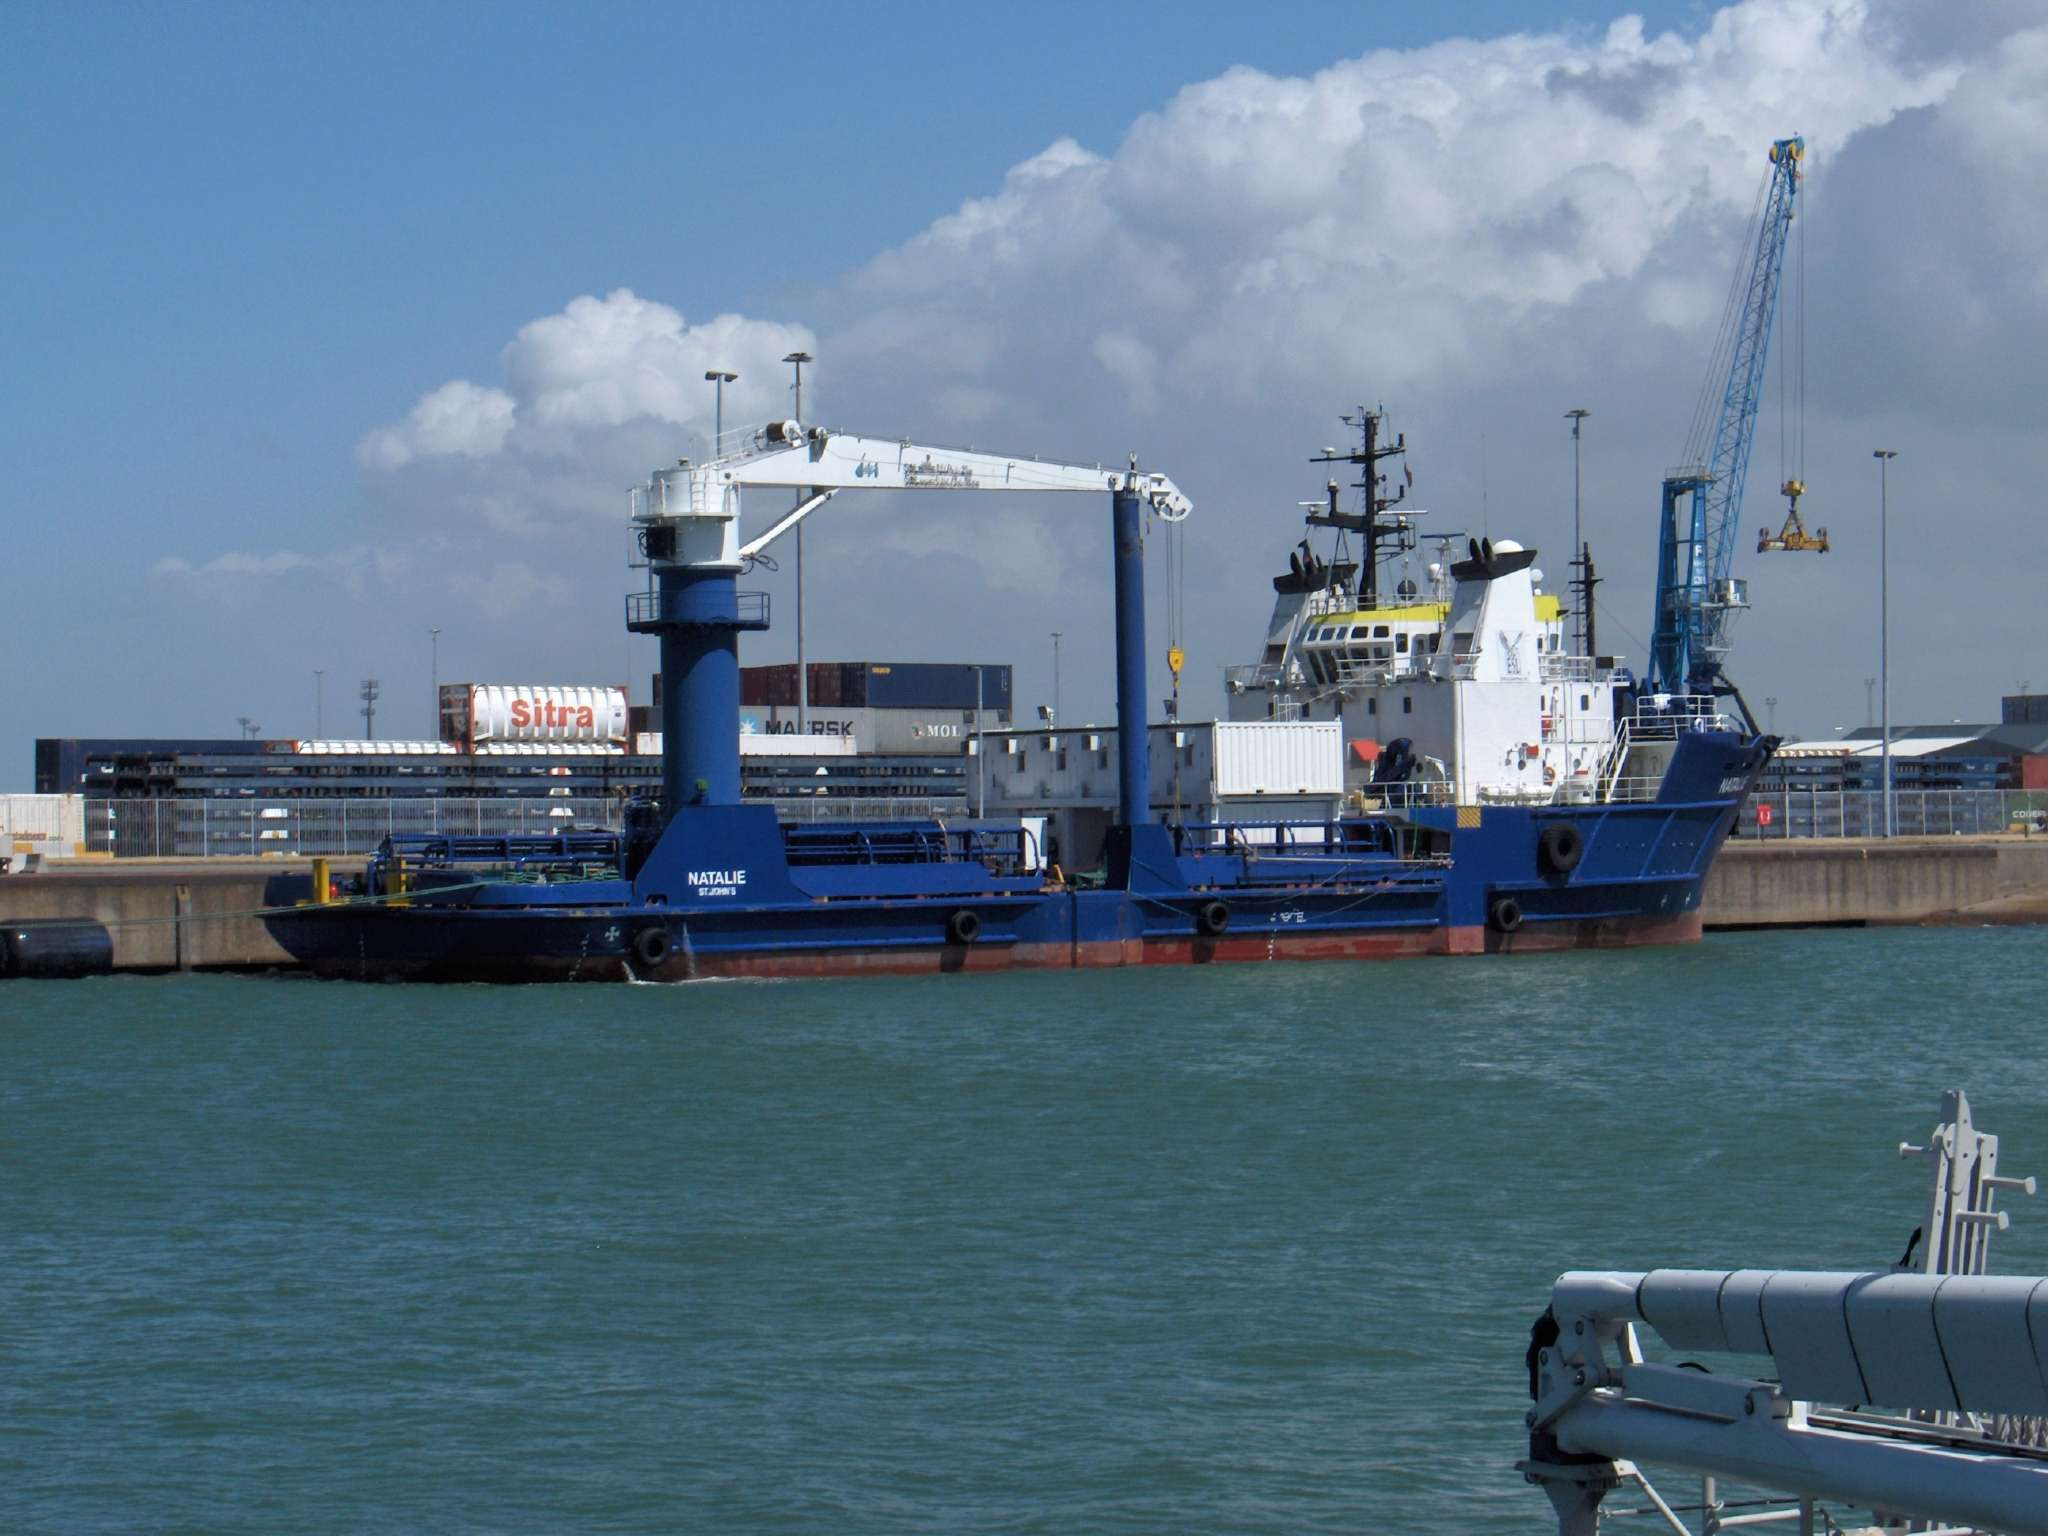 Zeebrugge naval base  news  Page 29